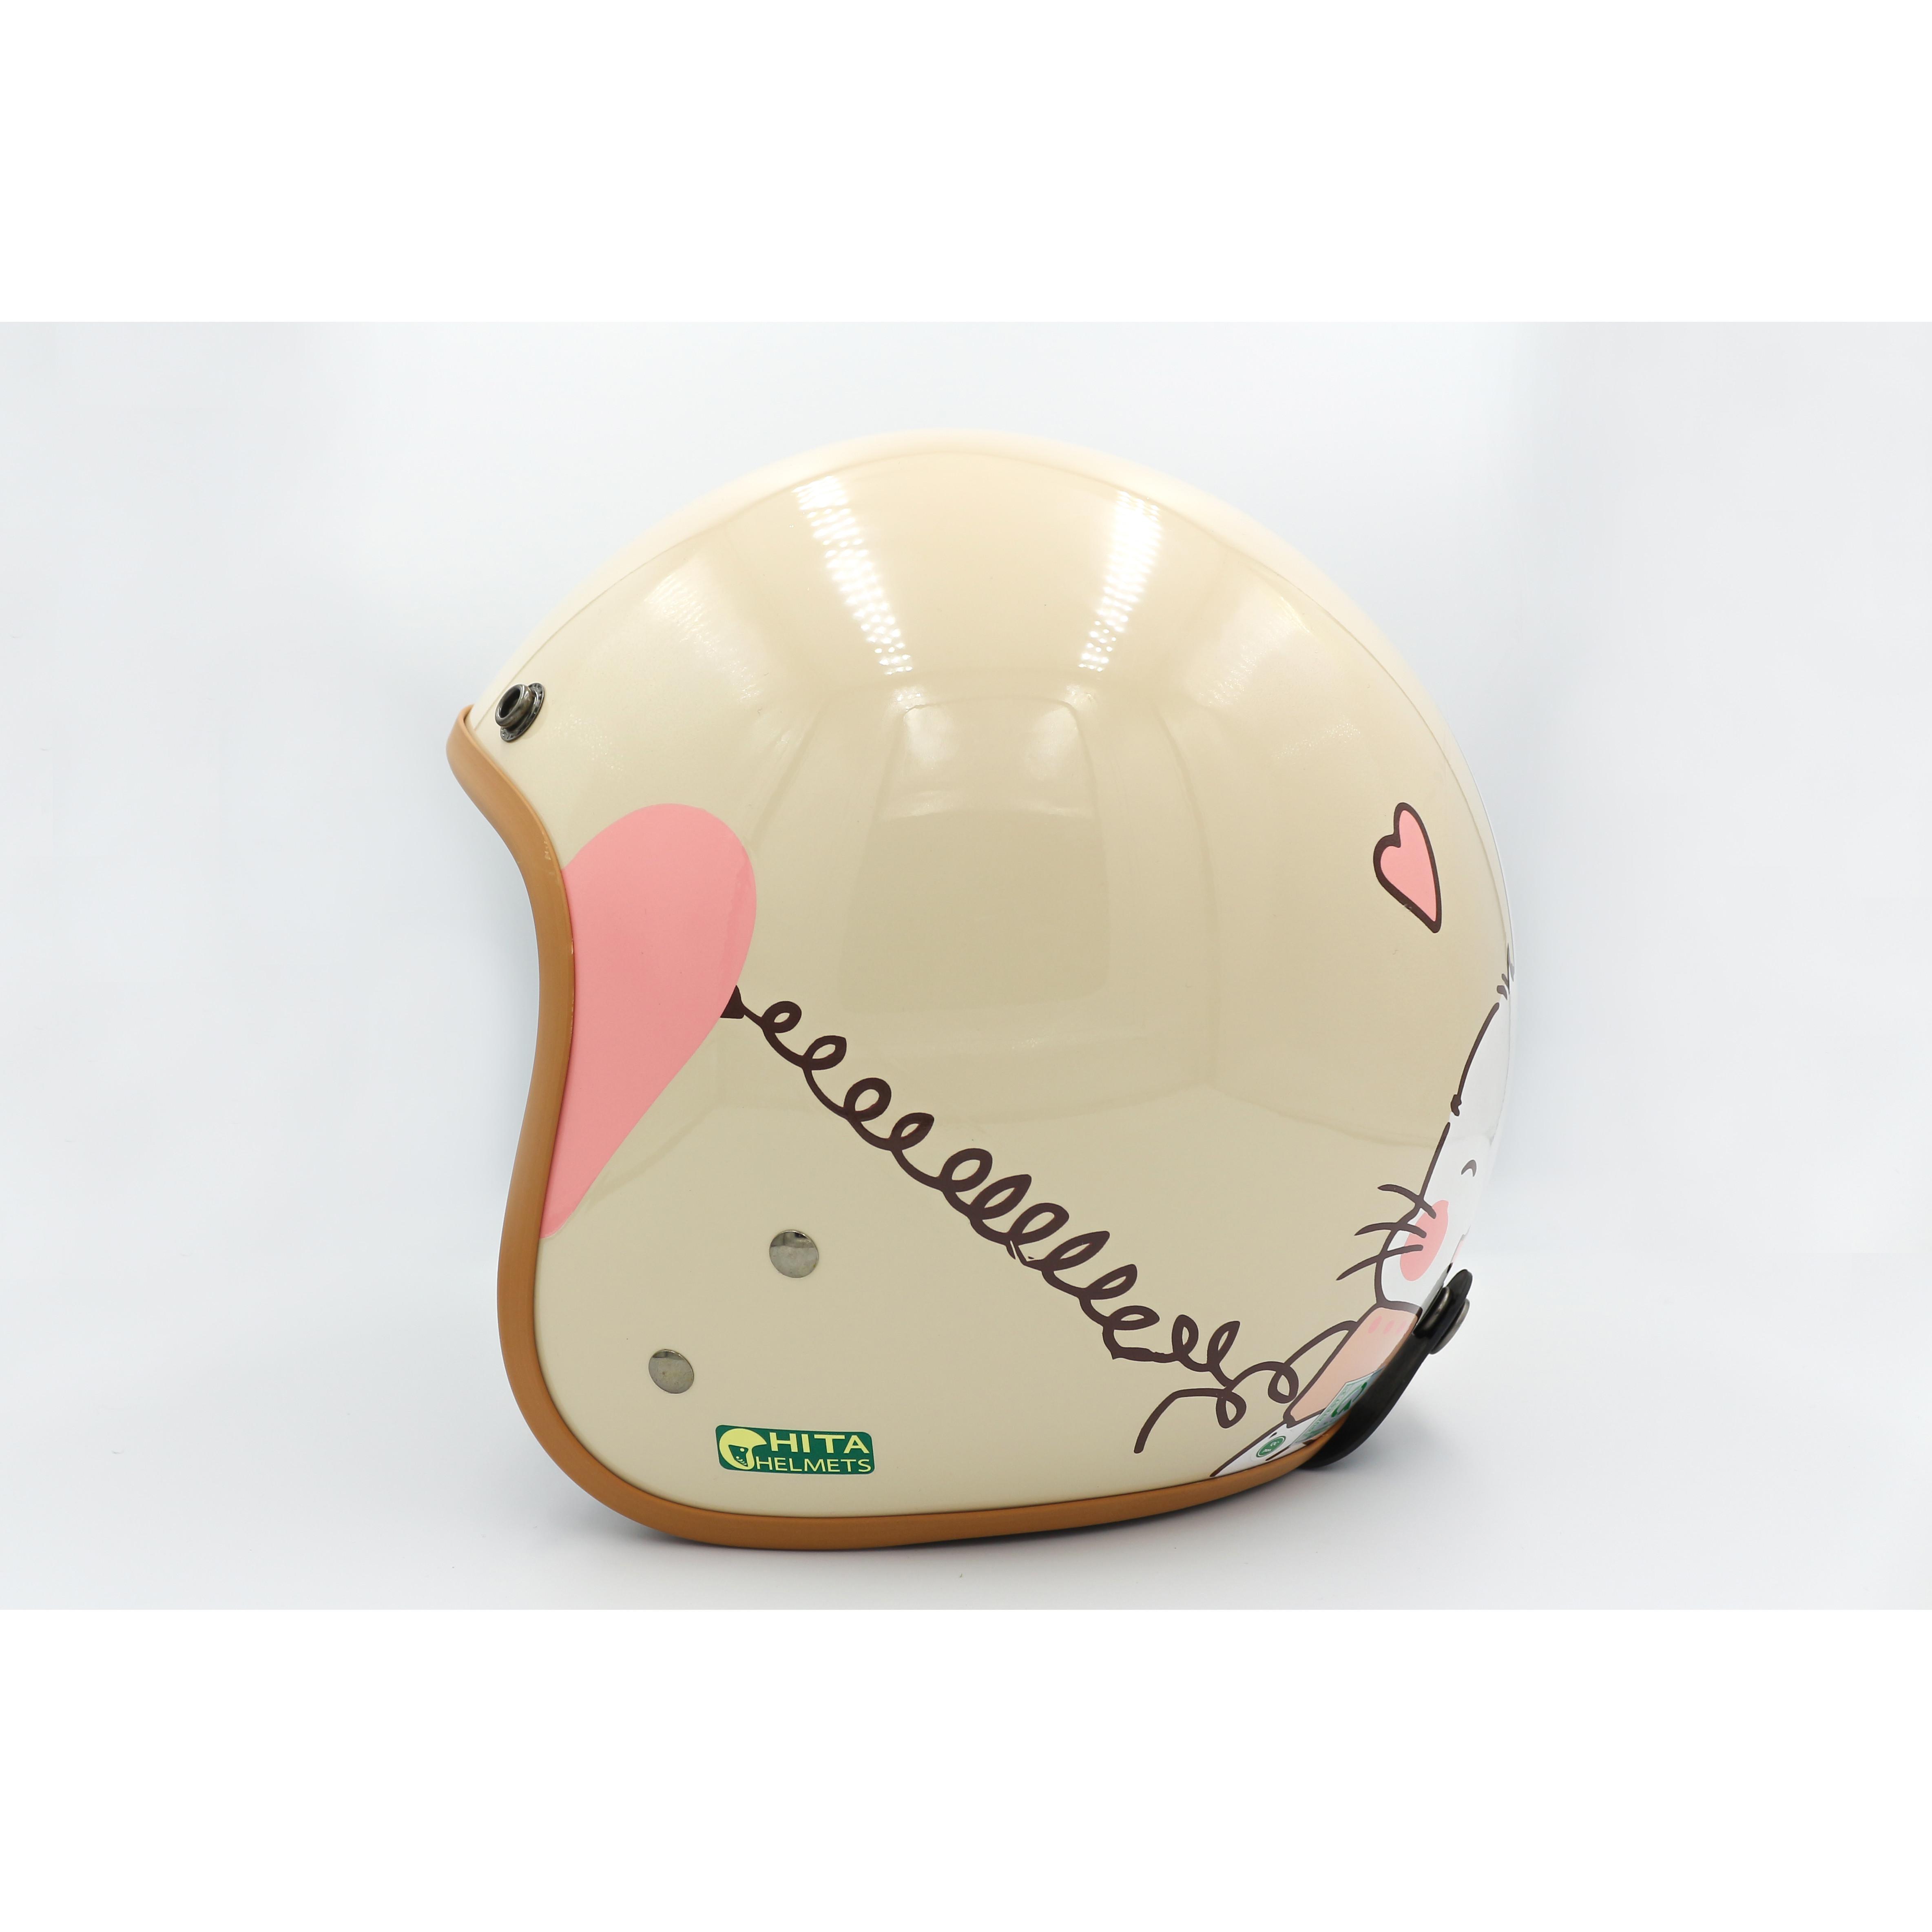 Mũ bảo hiểm Chita 3/4 - CT1 Nón cặp size M